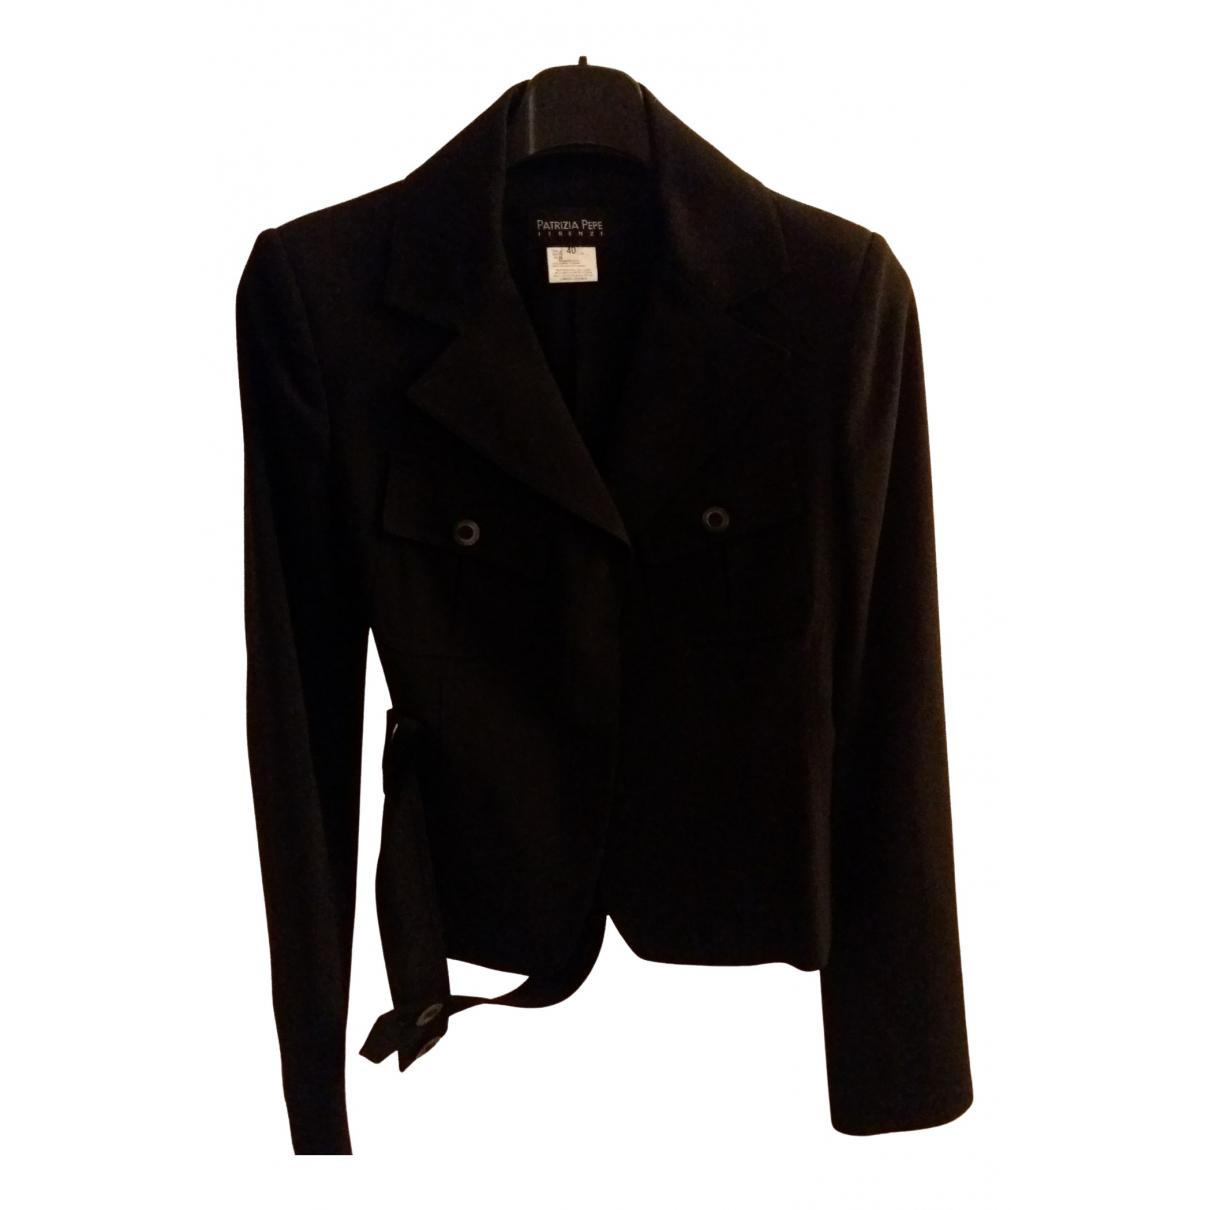 Patrizia Pepe \N Black jacket for Women 40 IT